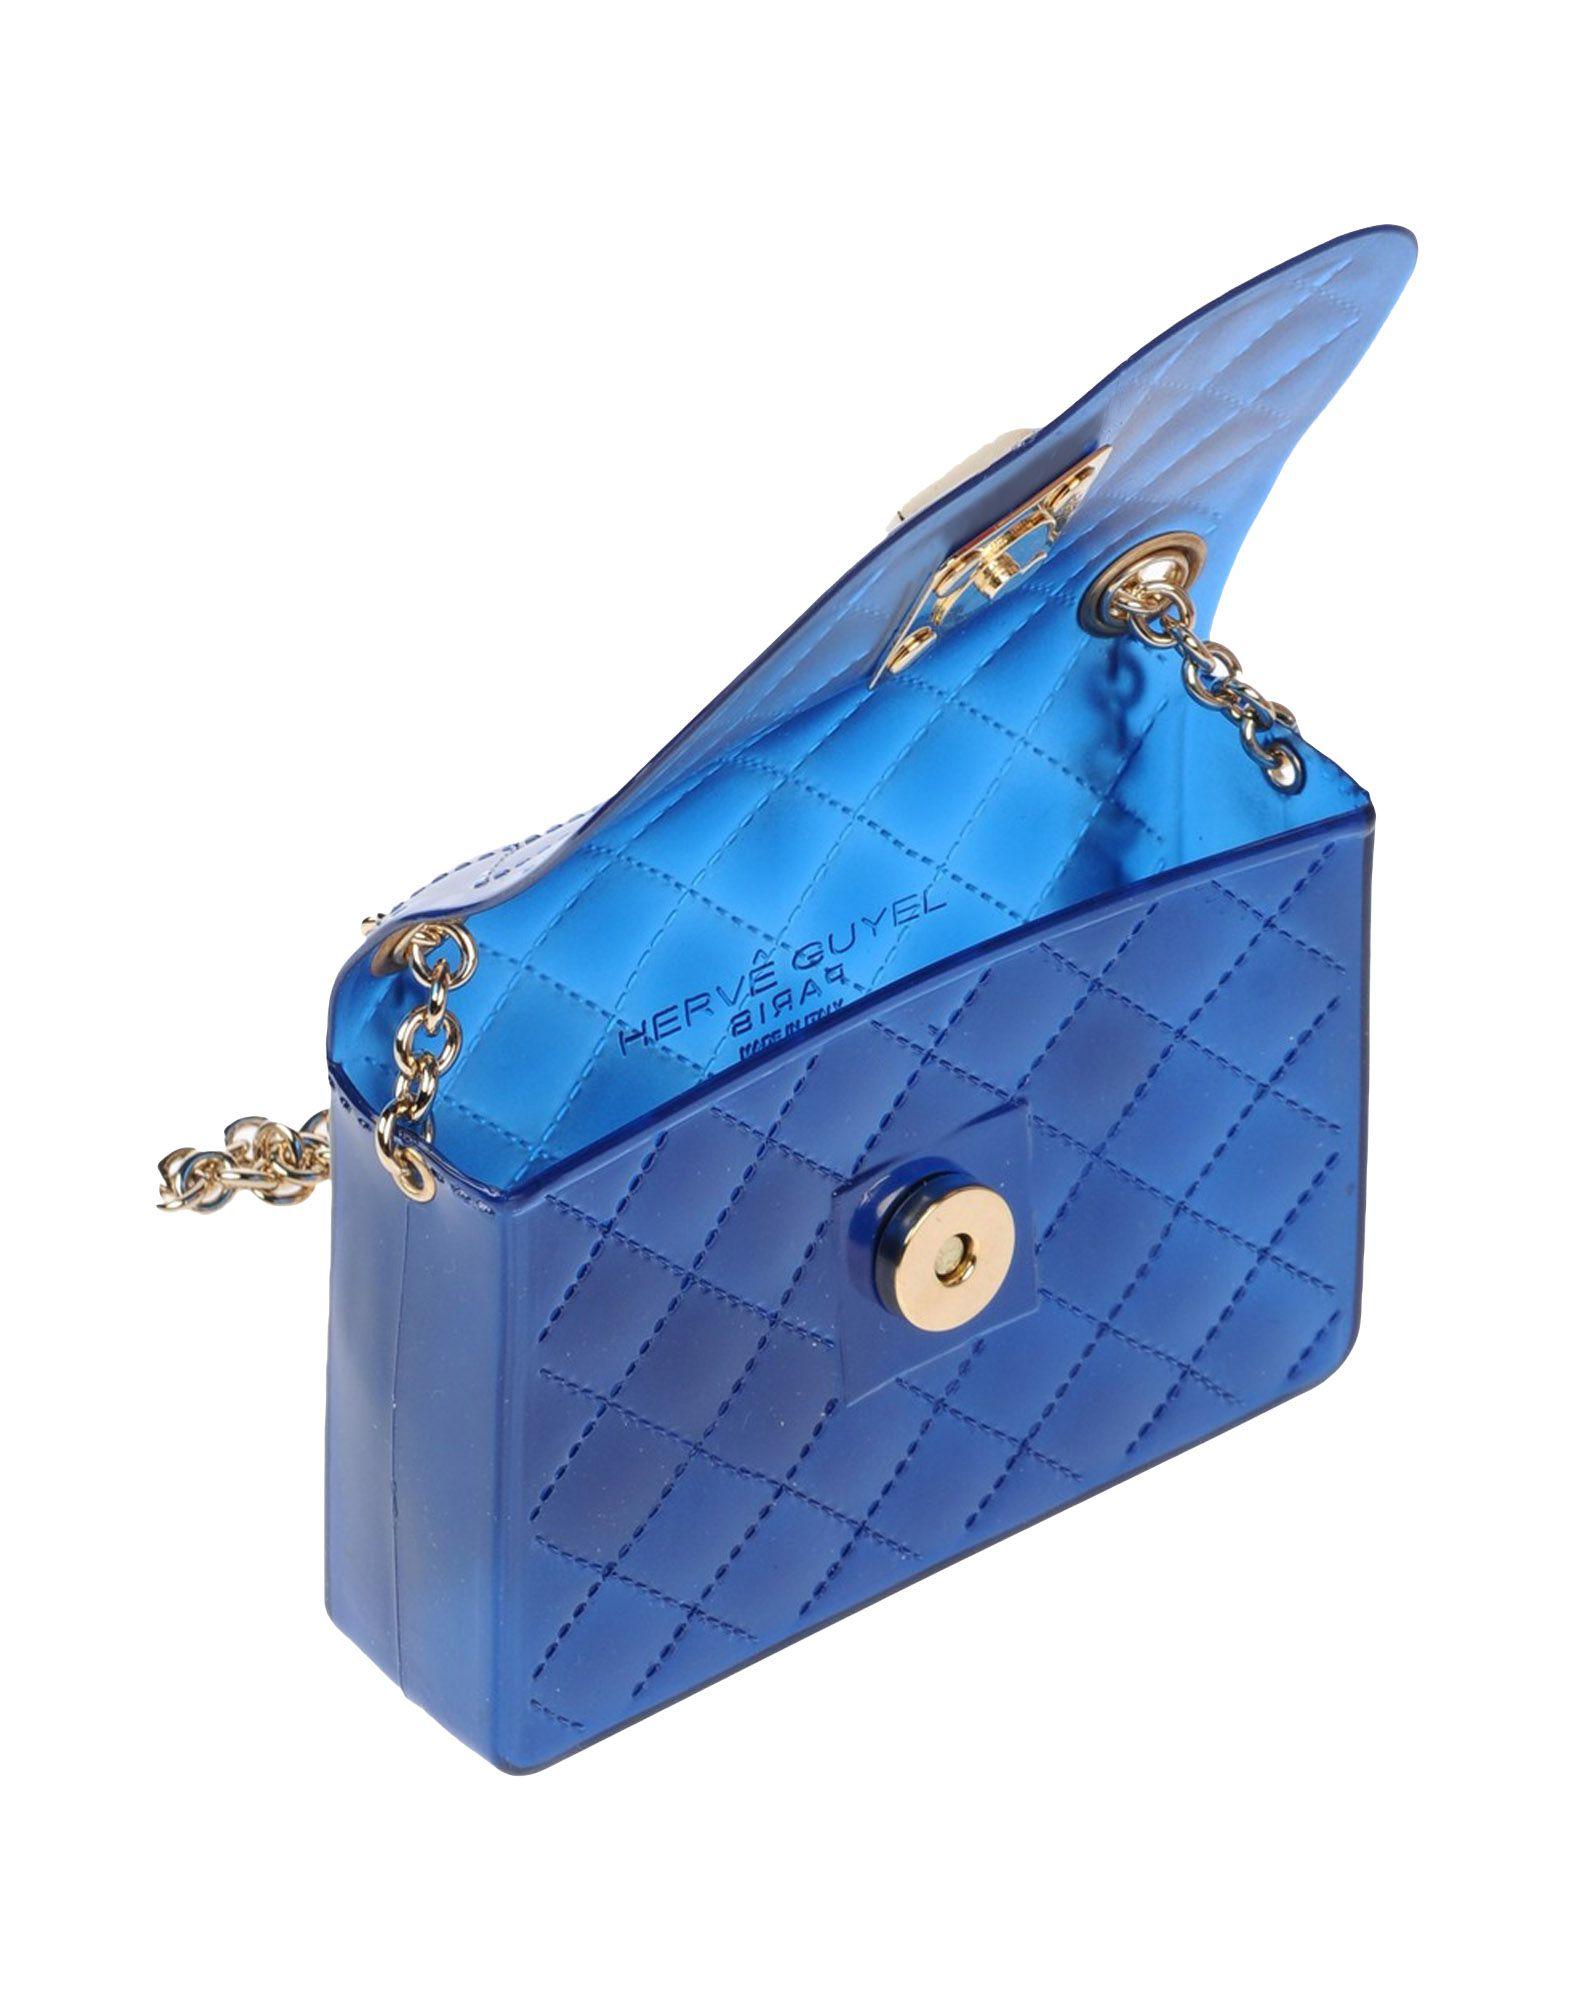 Hervê Guyel Cross-body Bag in Blue